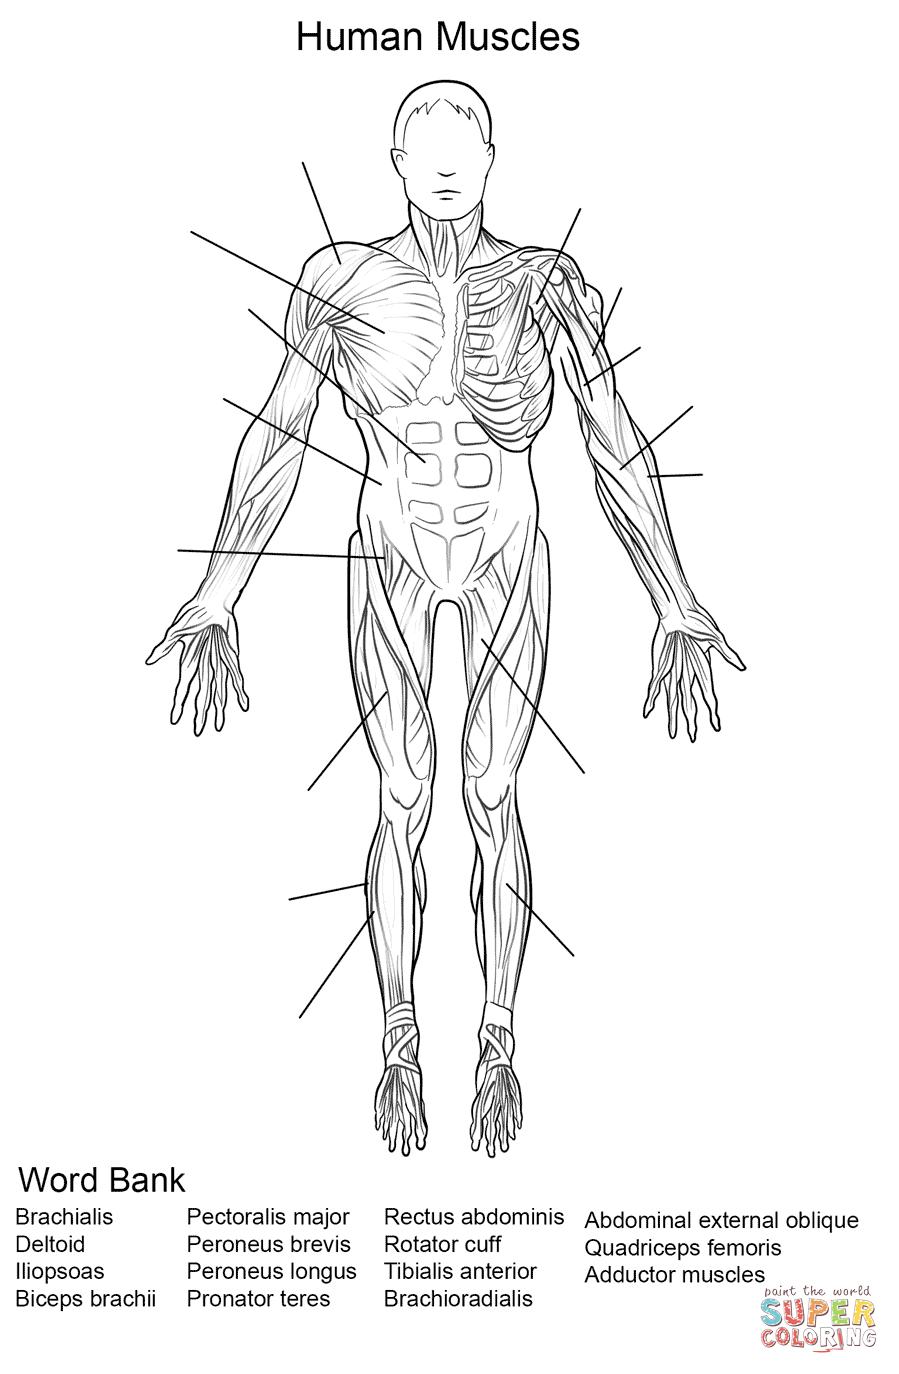 Human Muscles Front View Worksheet Coloring Page   Free Printable - Free Printable Human Anatomy Worksheets